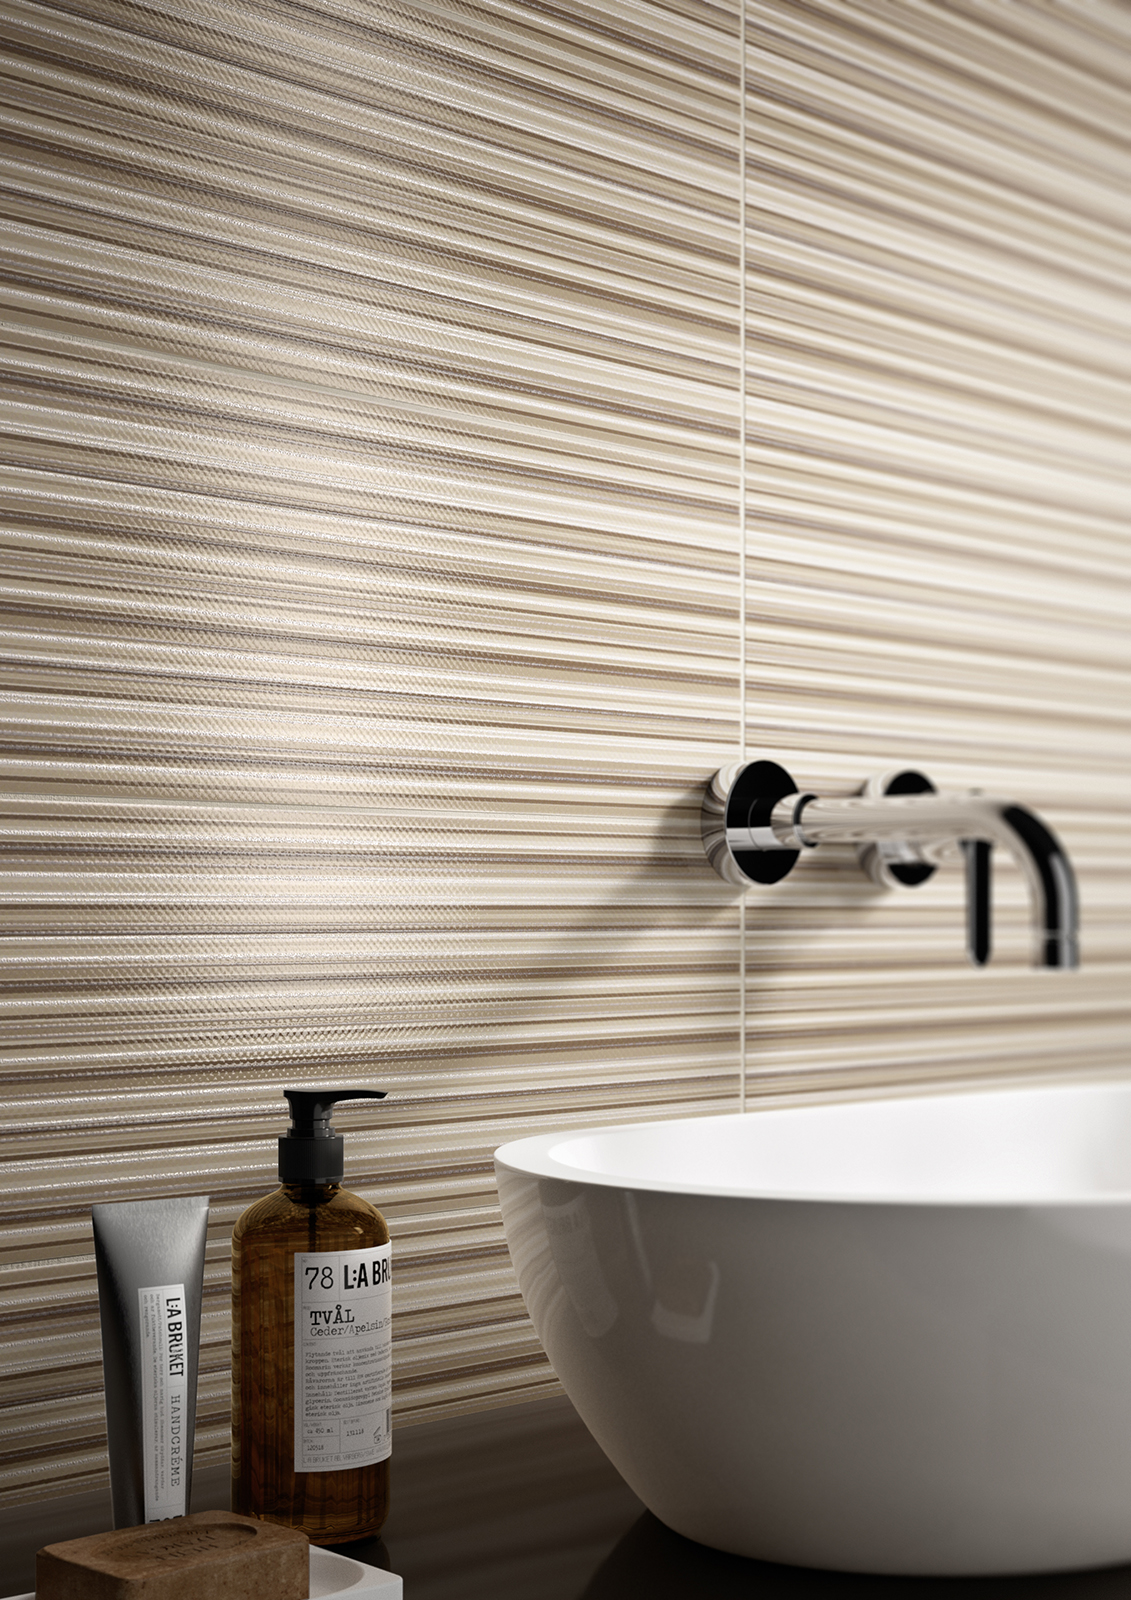 Shine fabric effect covering marazzi shine ceramic tiles marazzi6186 doublecrazyfo Images